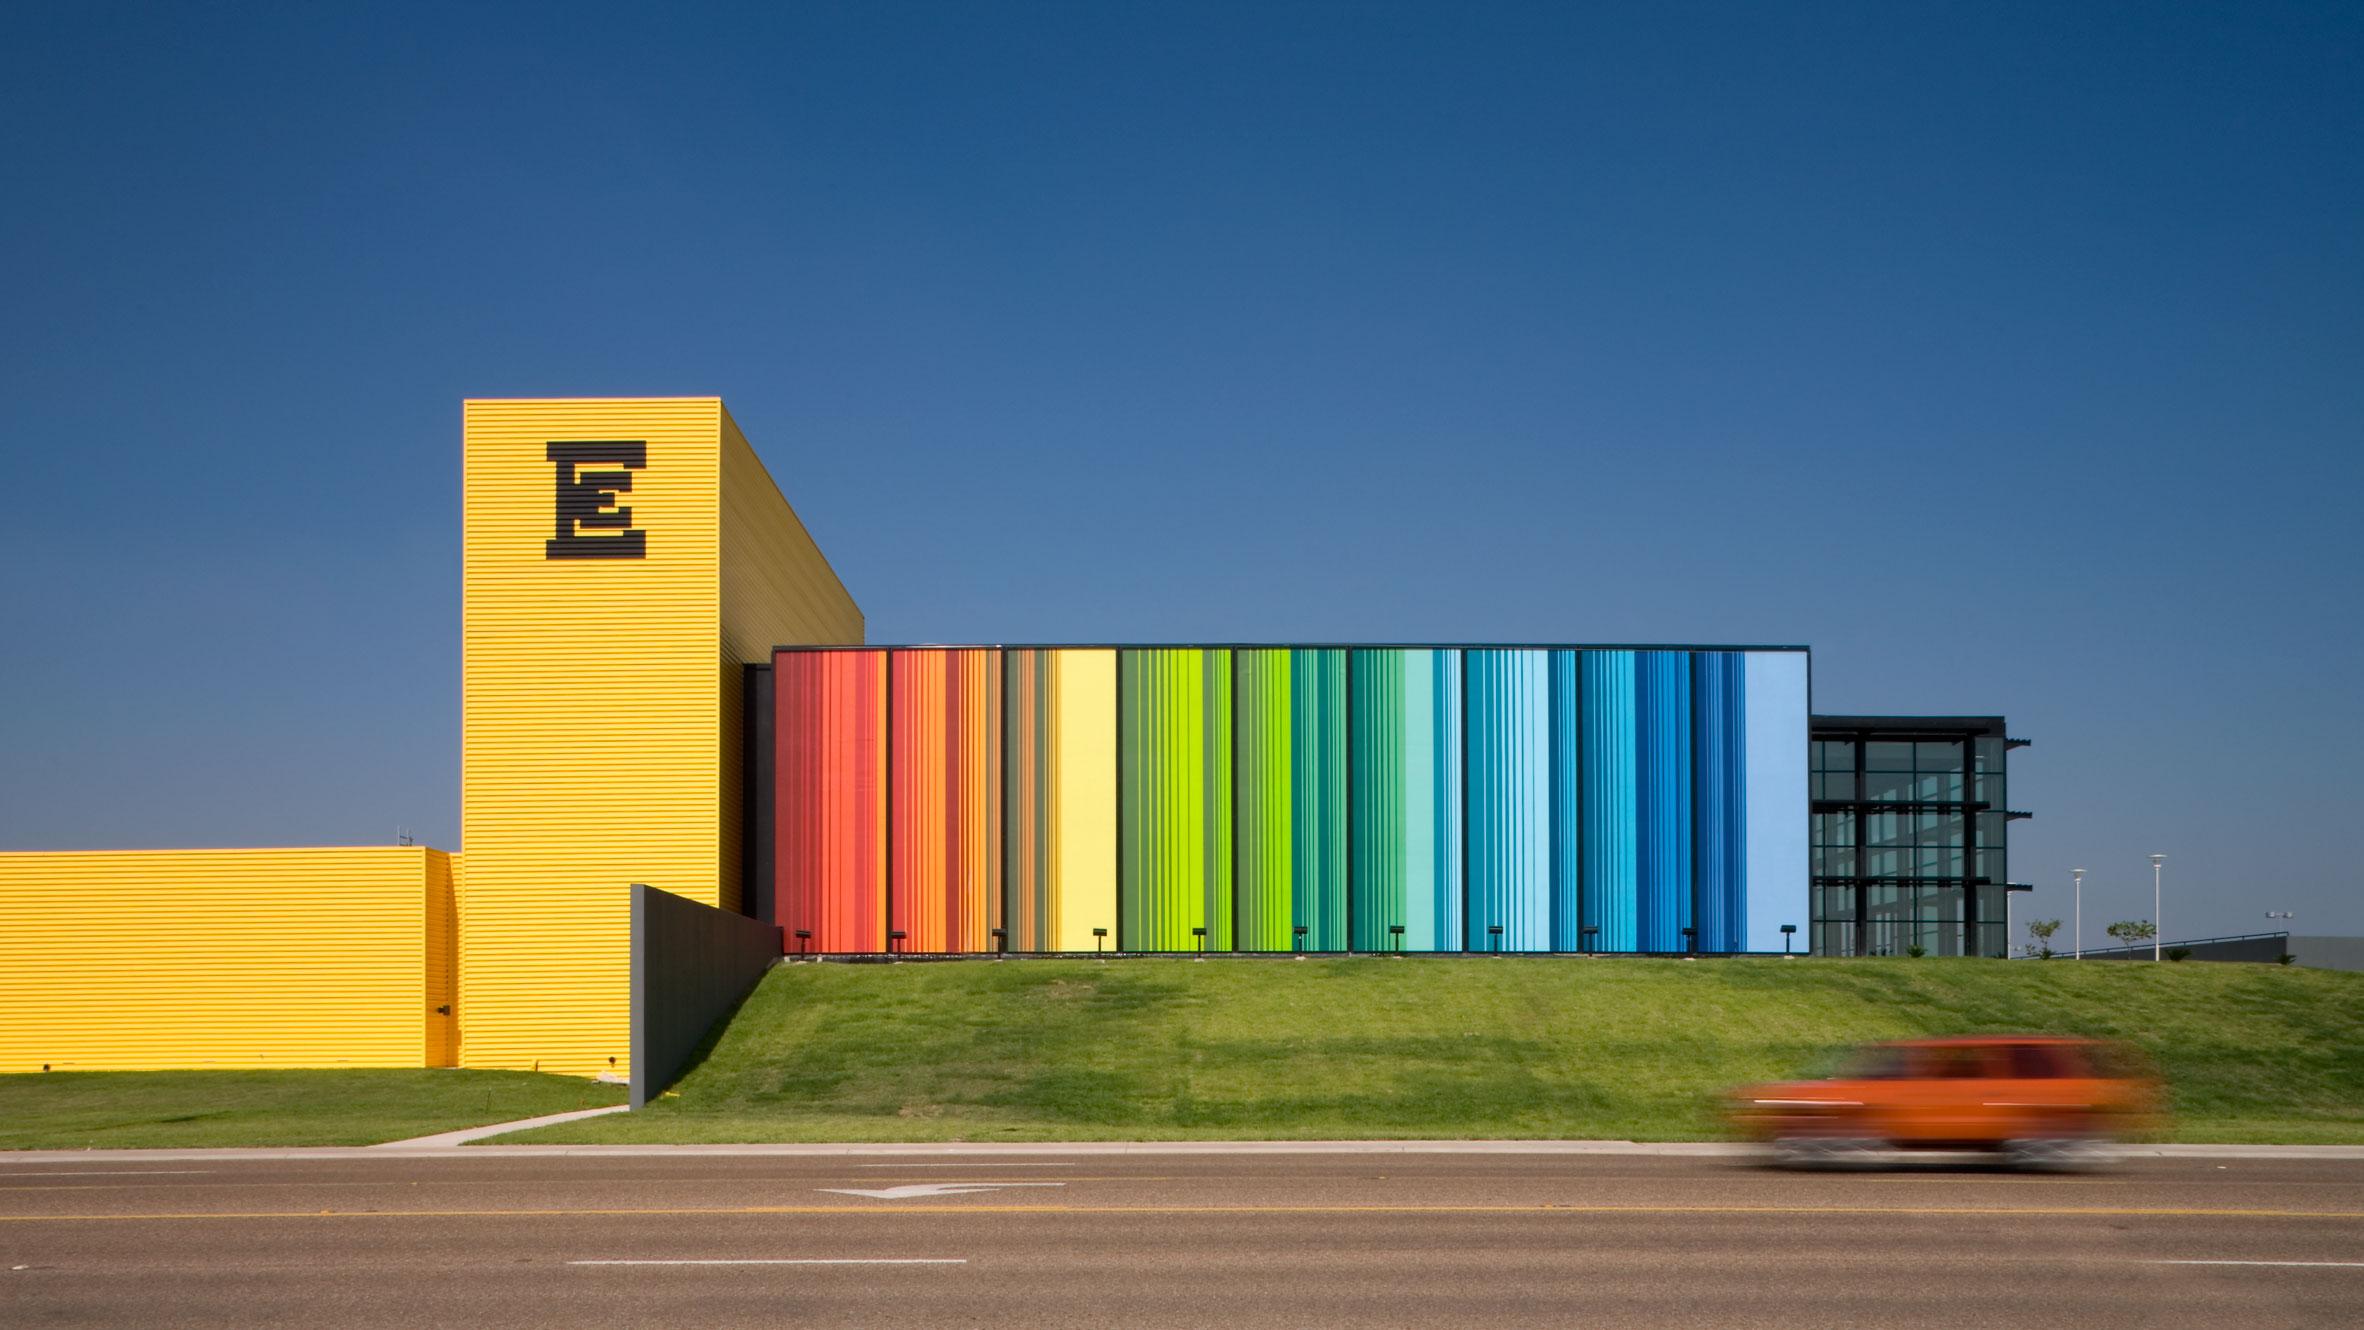 Edcouch-Elsa ISD Fine Arts Center by Kell Muñoz Architects